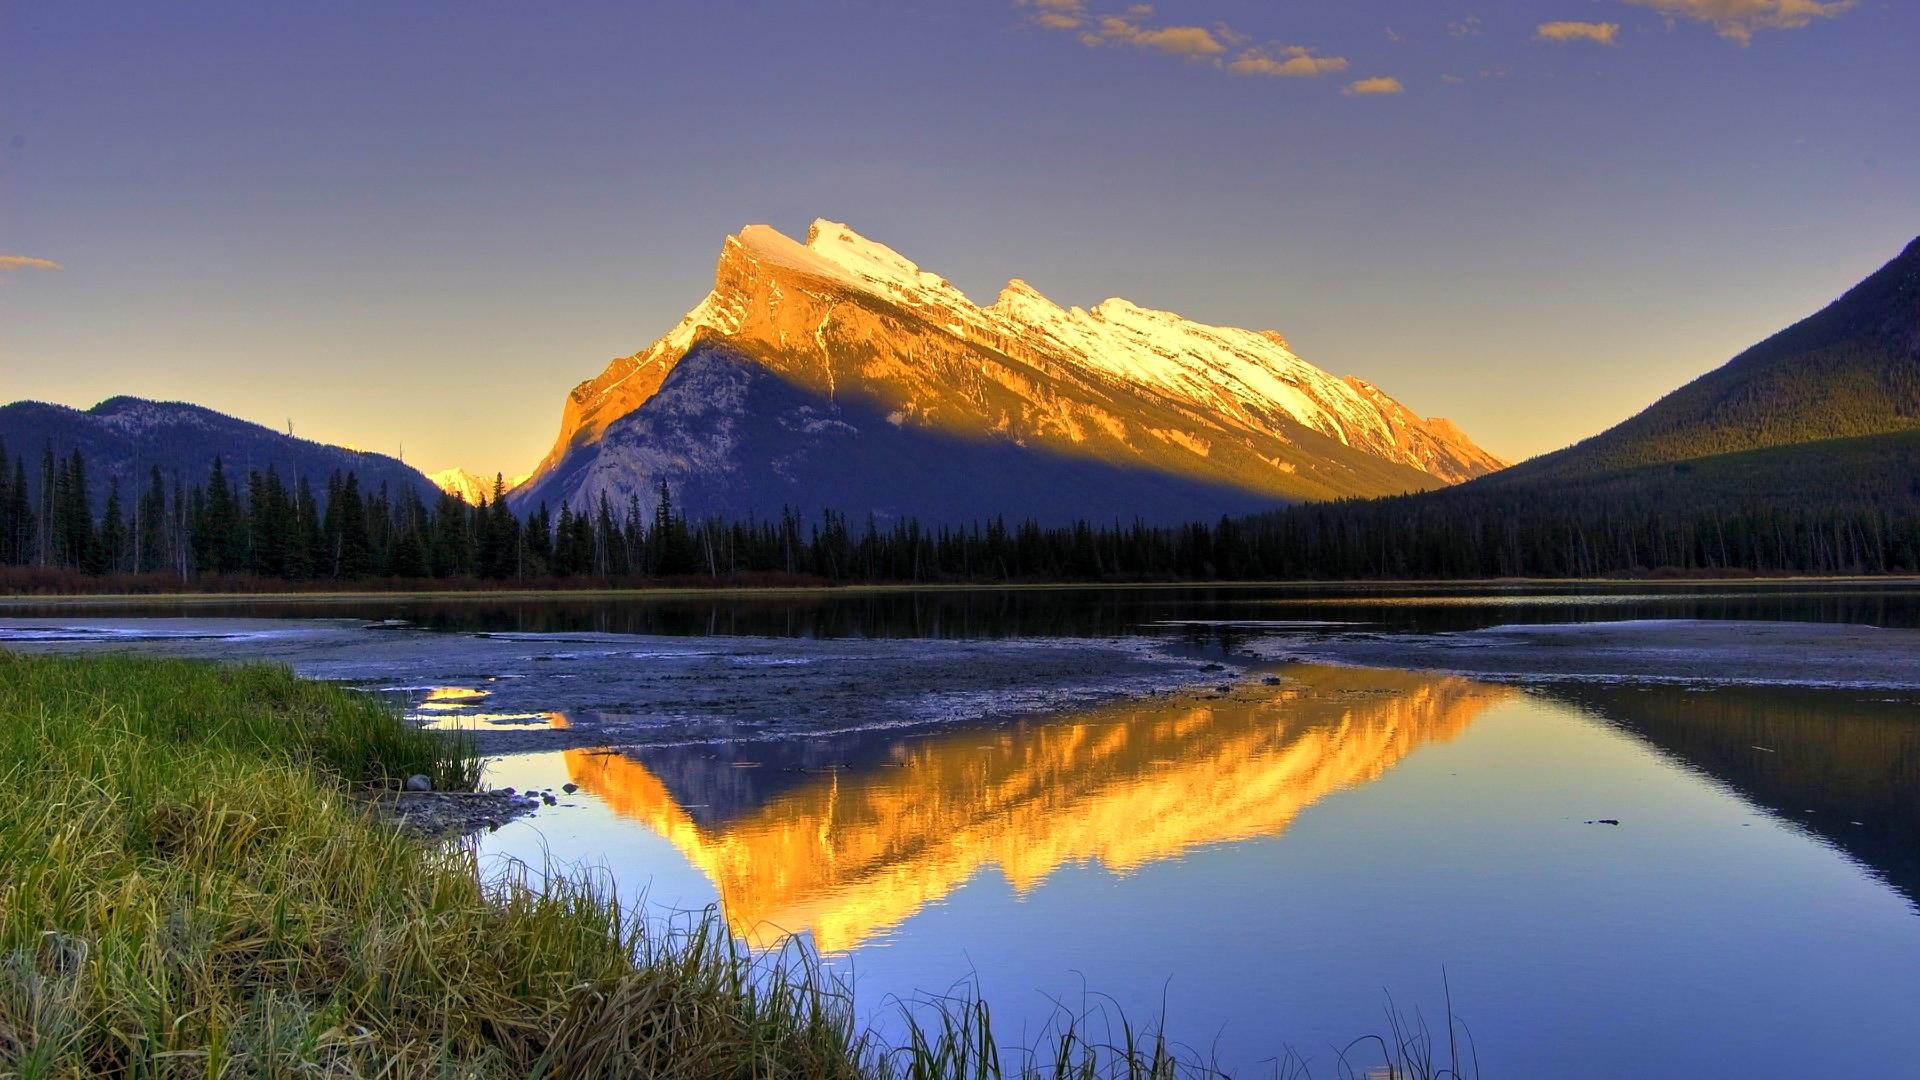 windows 10 wallpaper download,natural landscape,nature,reflection,mountain,sky